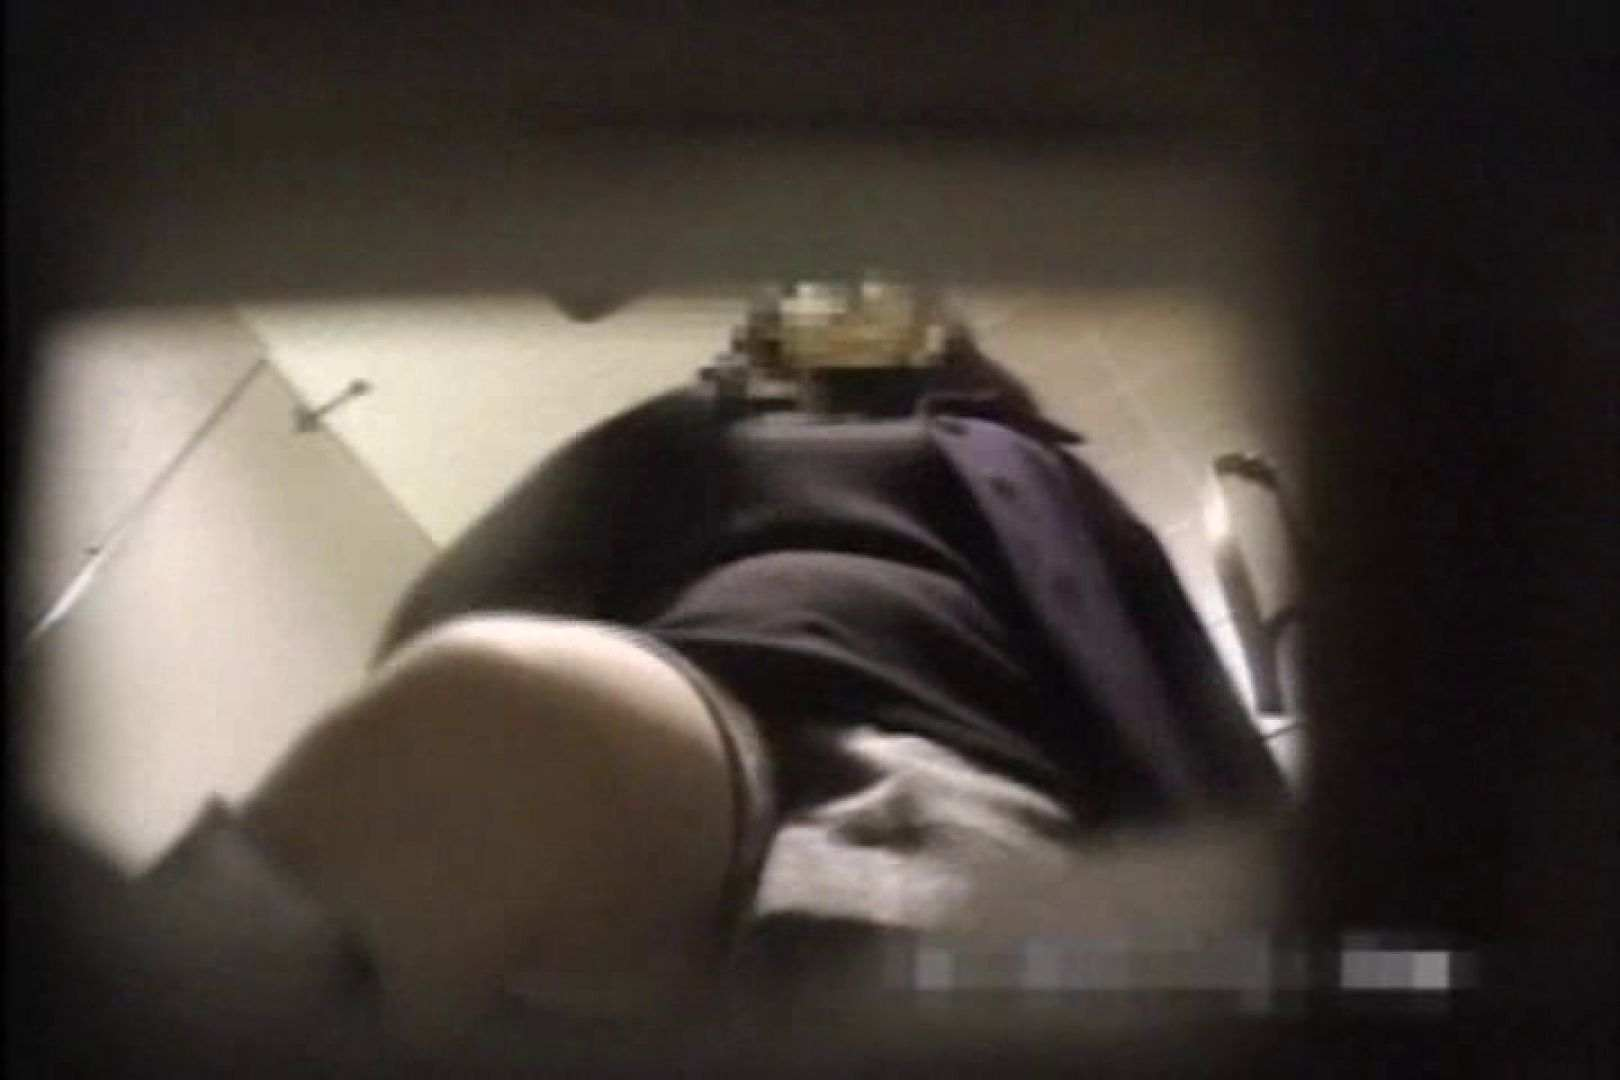 STY-013 実録!2カメde女子洗面所 洗面所 濡れ場動画紹介 90連発 80